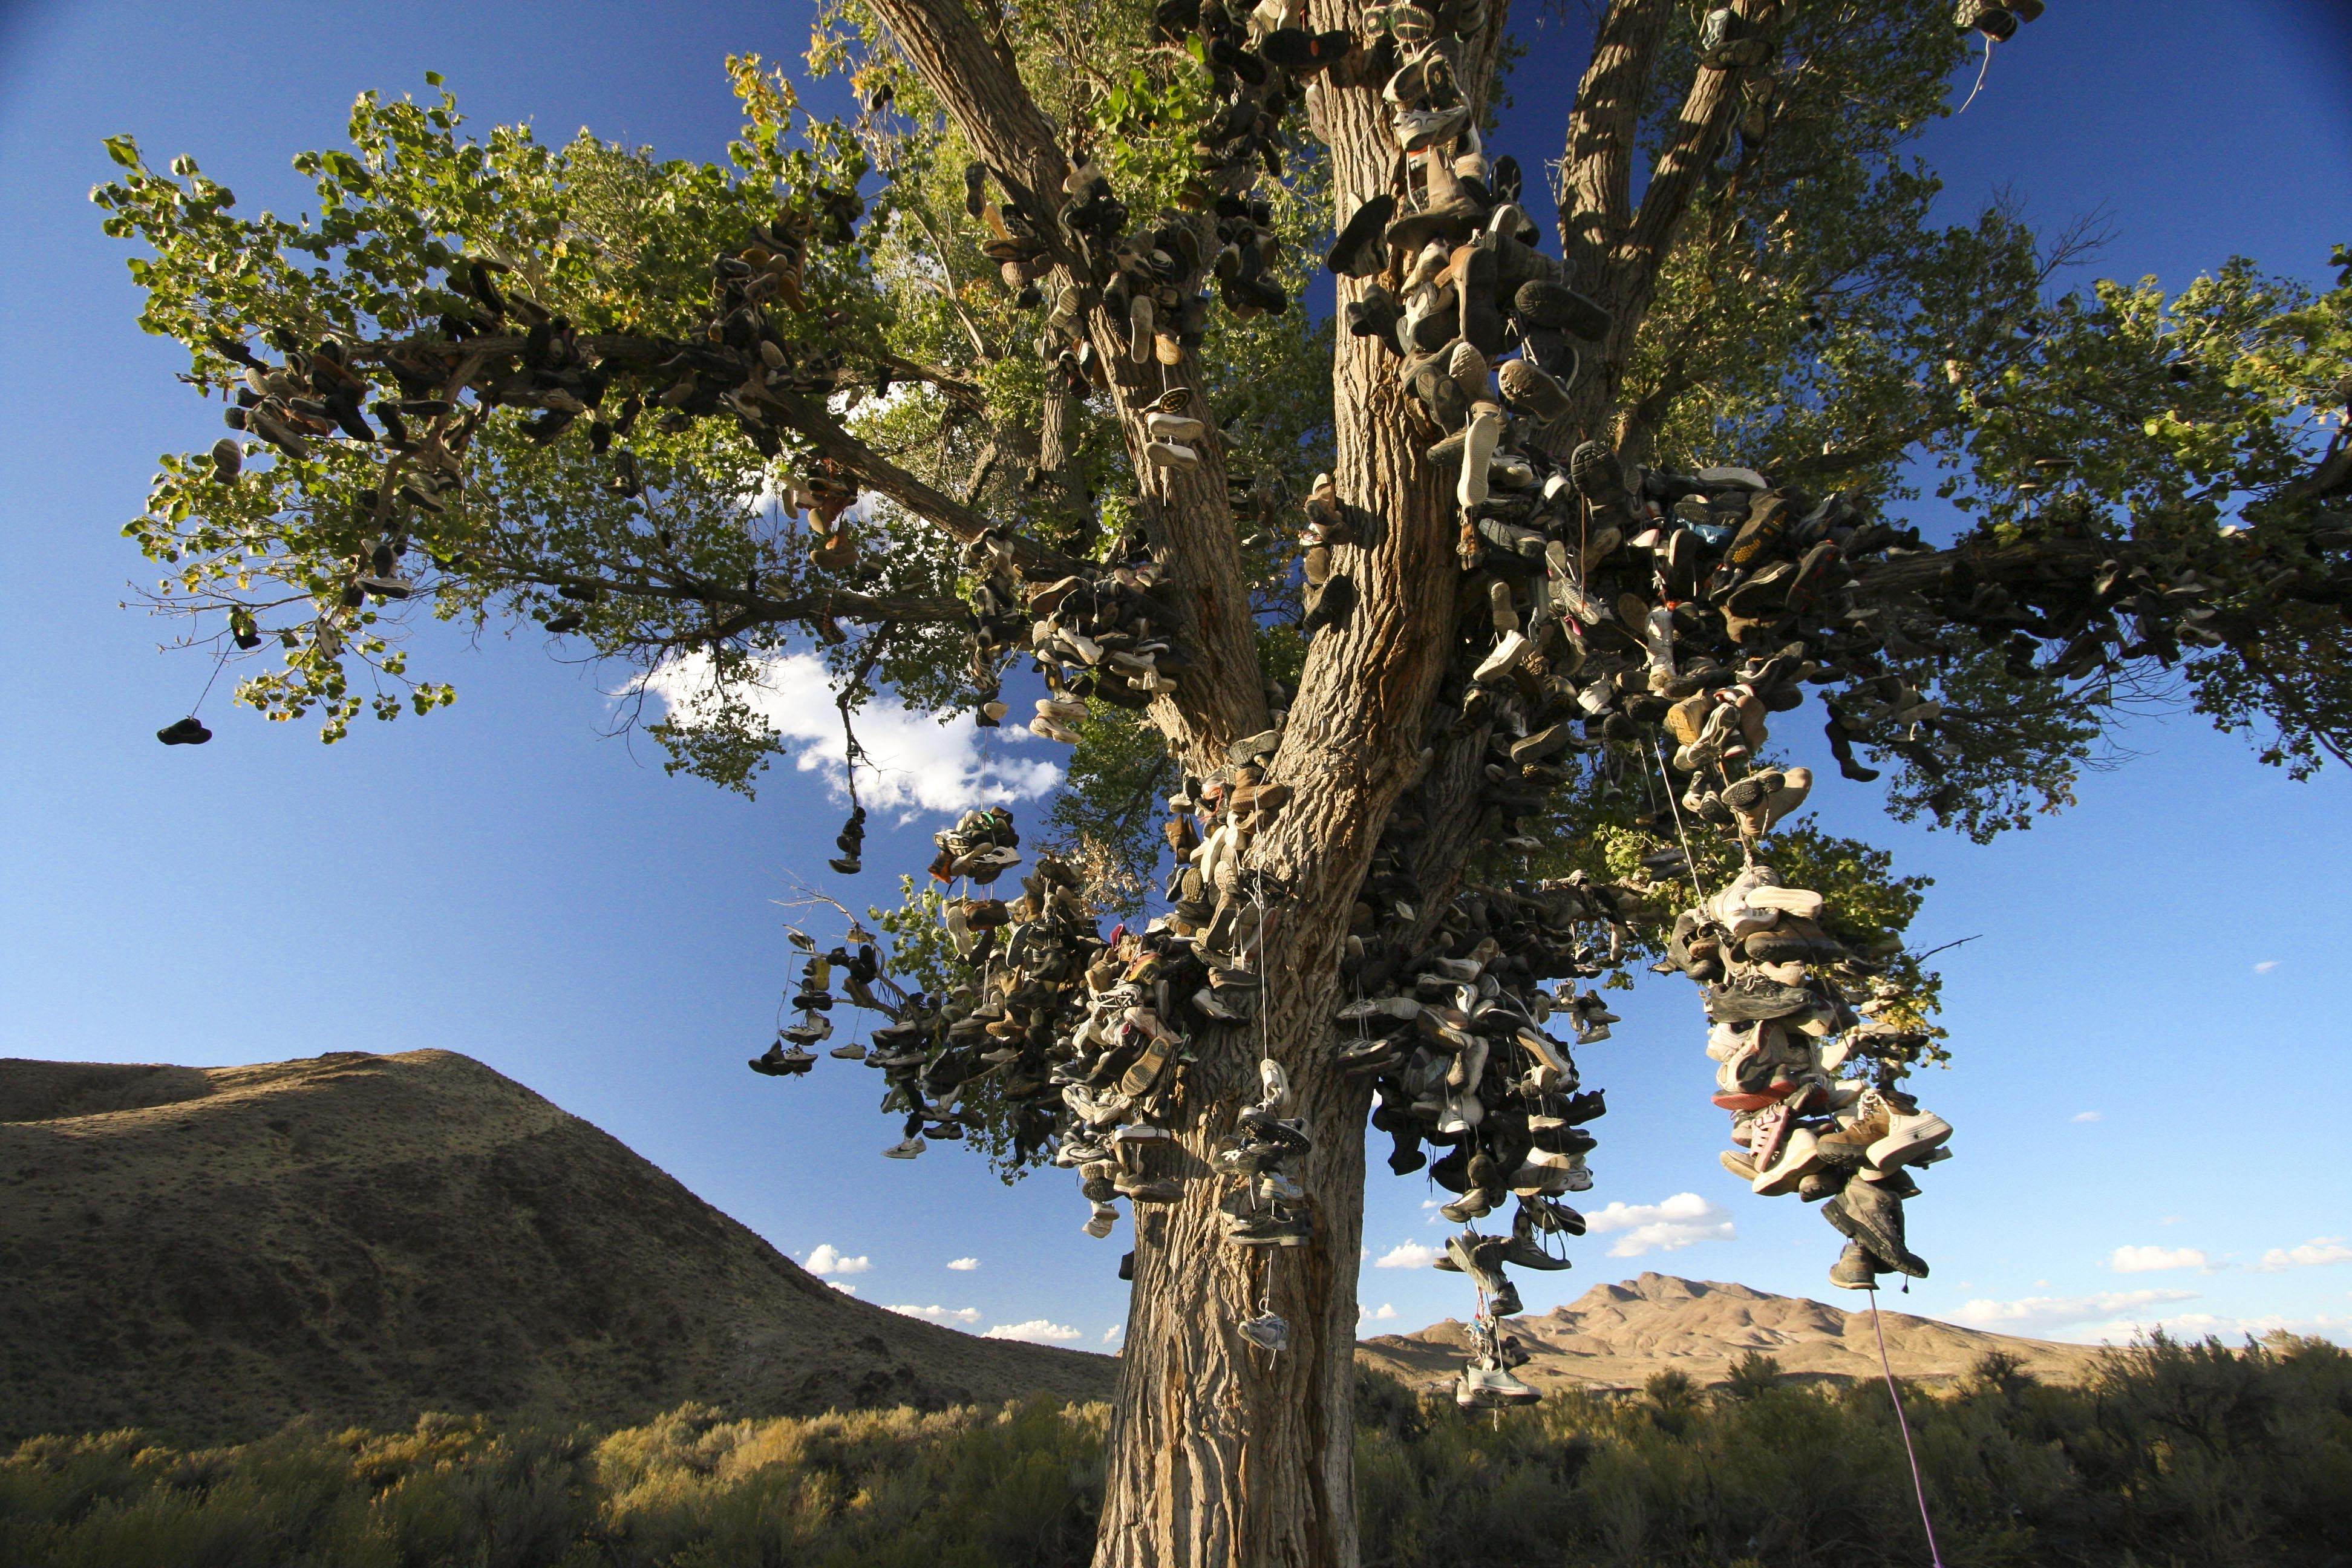 Tree Shoes Nevada Shoe Tree is Beyond me